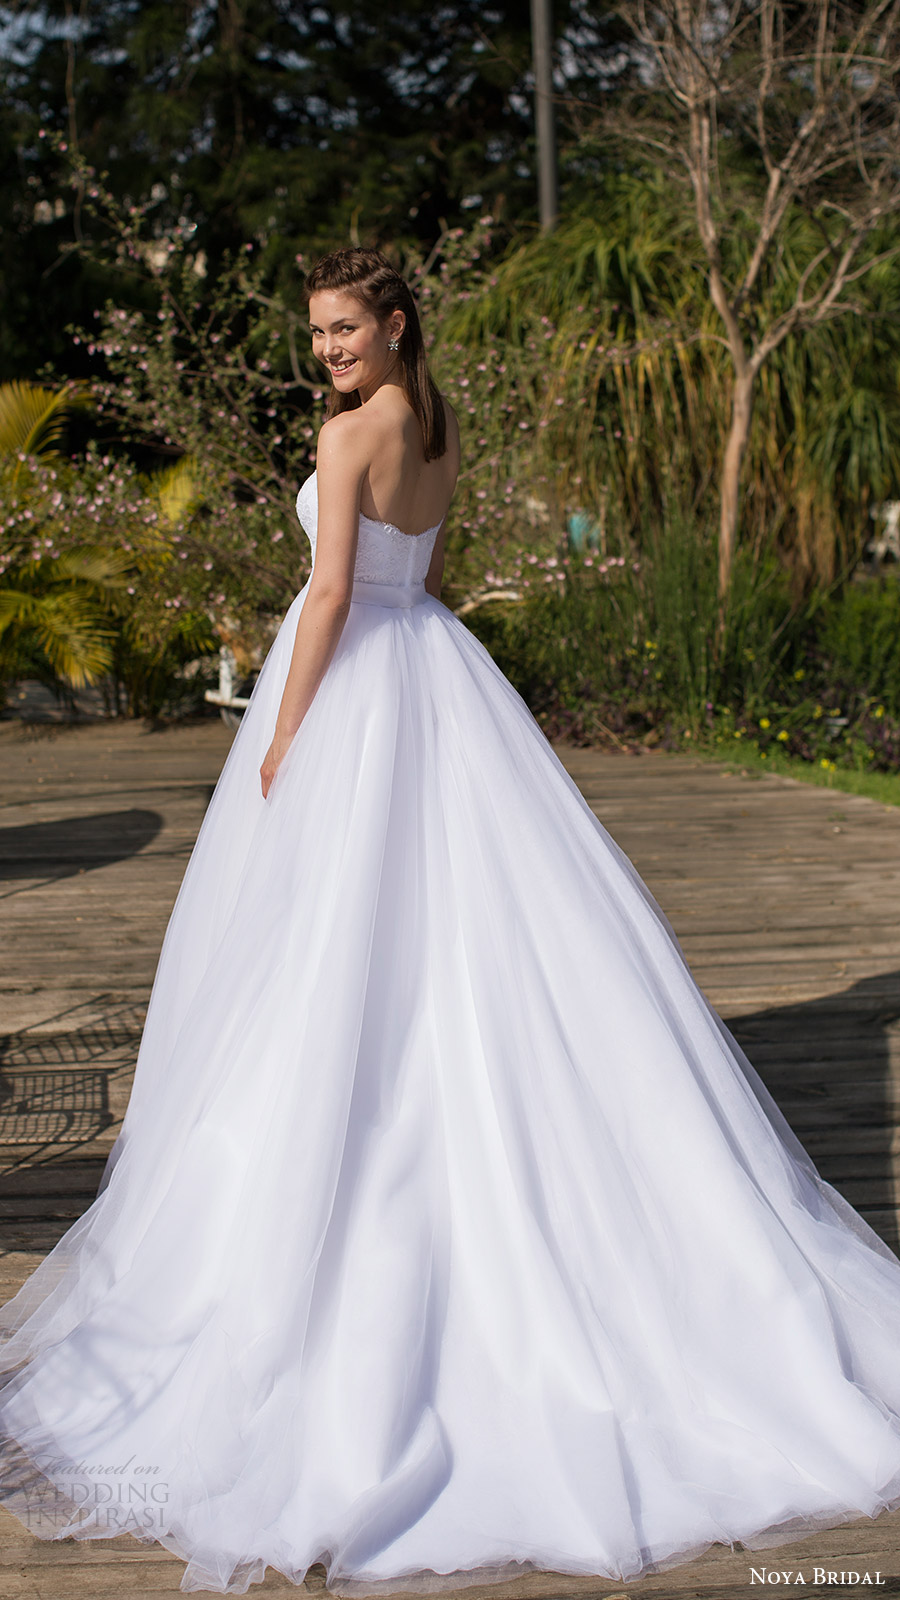 noya bridal 2016 3 strapless sweetheart ball gown wedding dress (1210) bv princess romantic